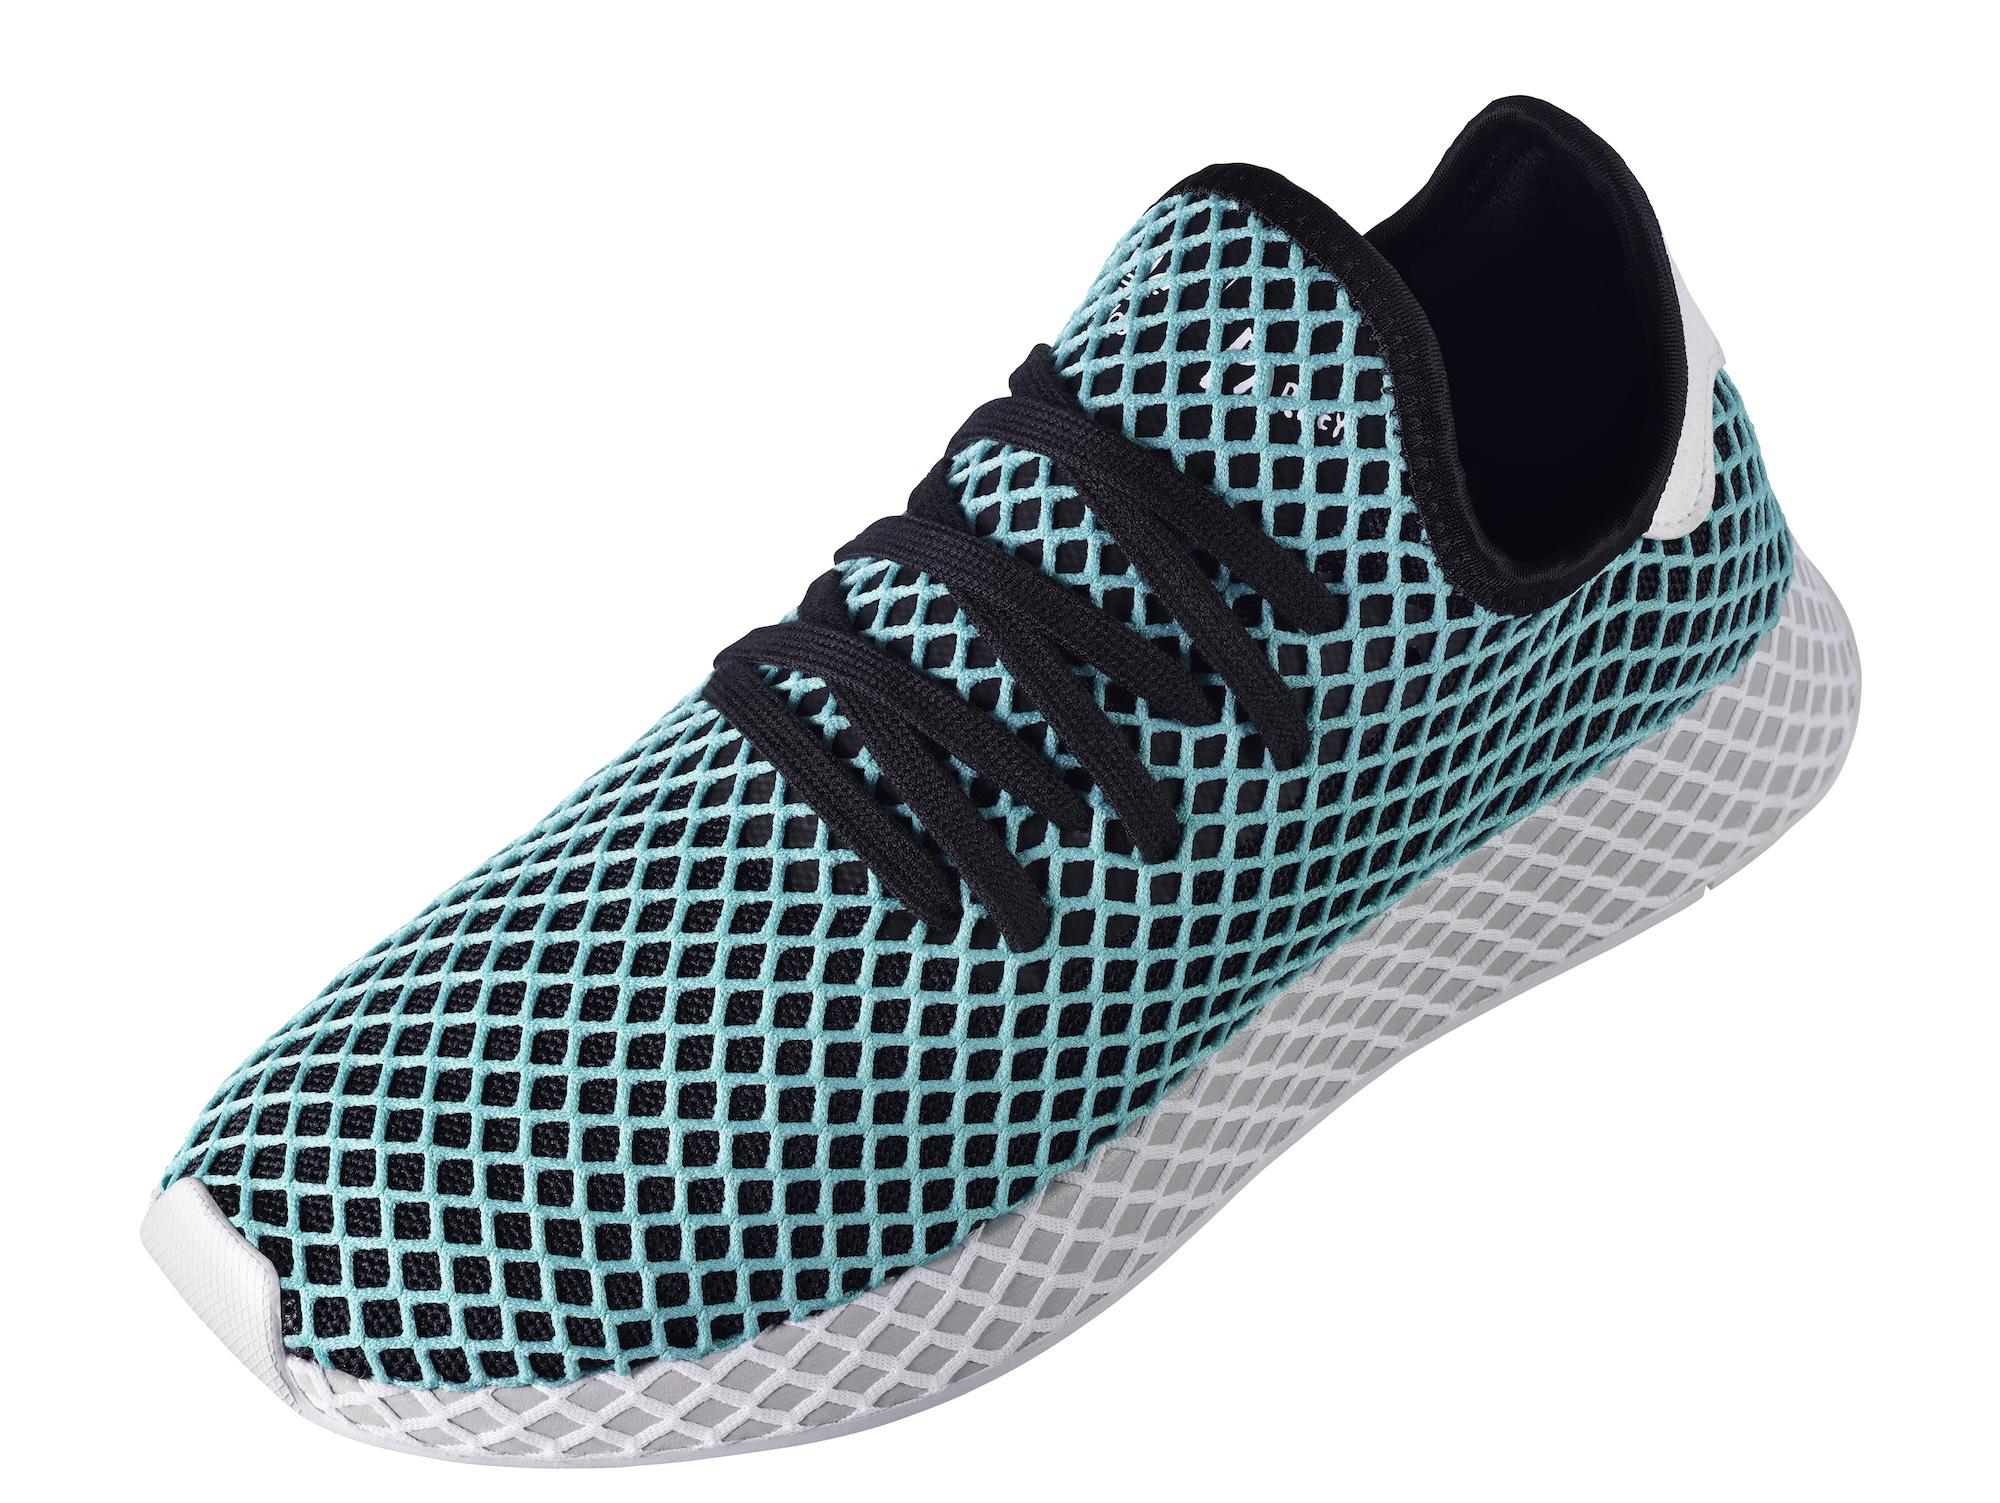 on sale 326a8 182d5 Adidas Deerupt Parley 4